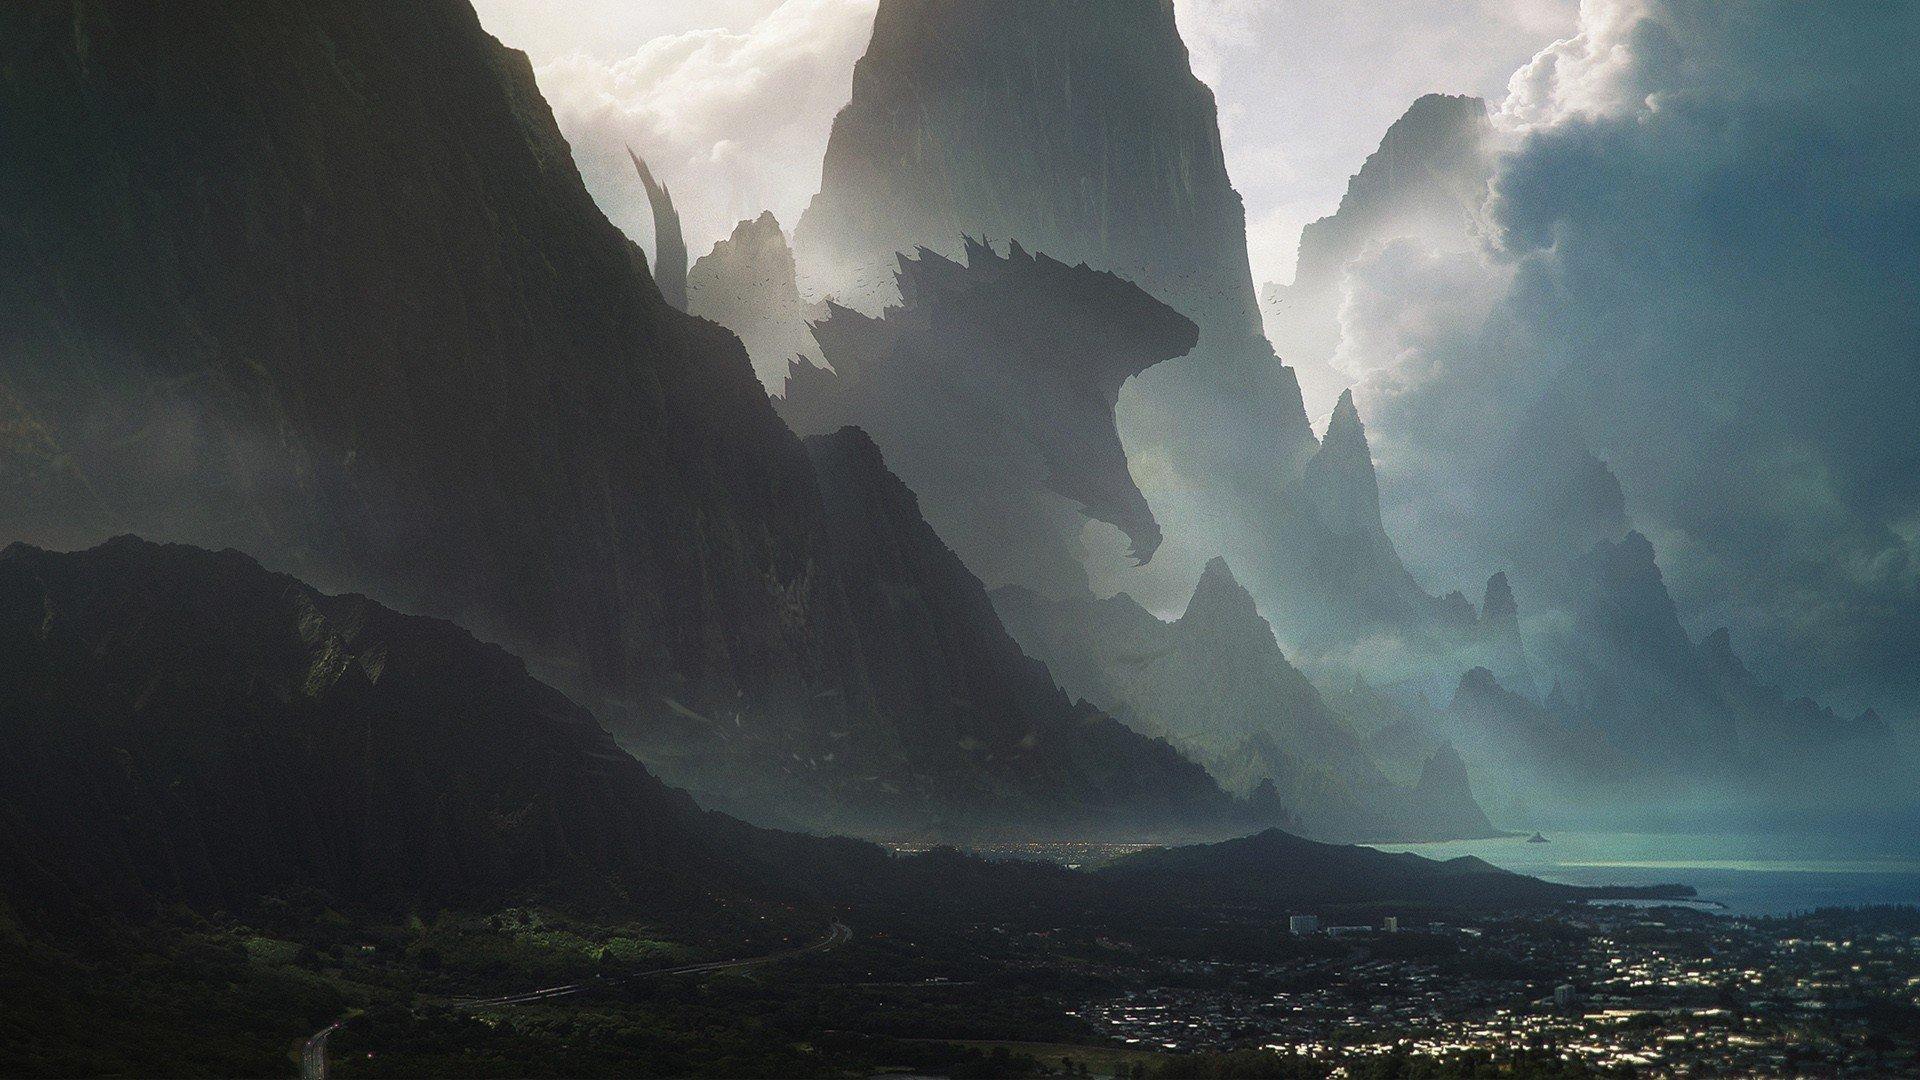 Hawaii-Godzilla-Wallpapers-HD